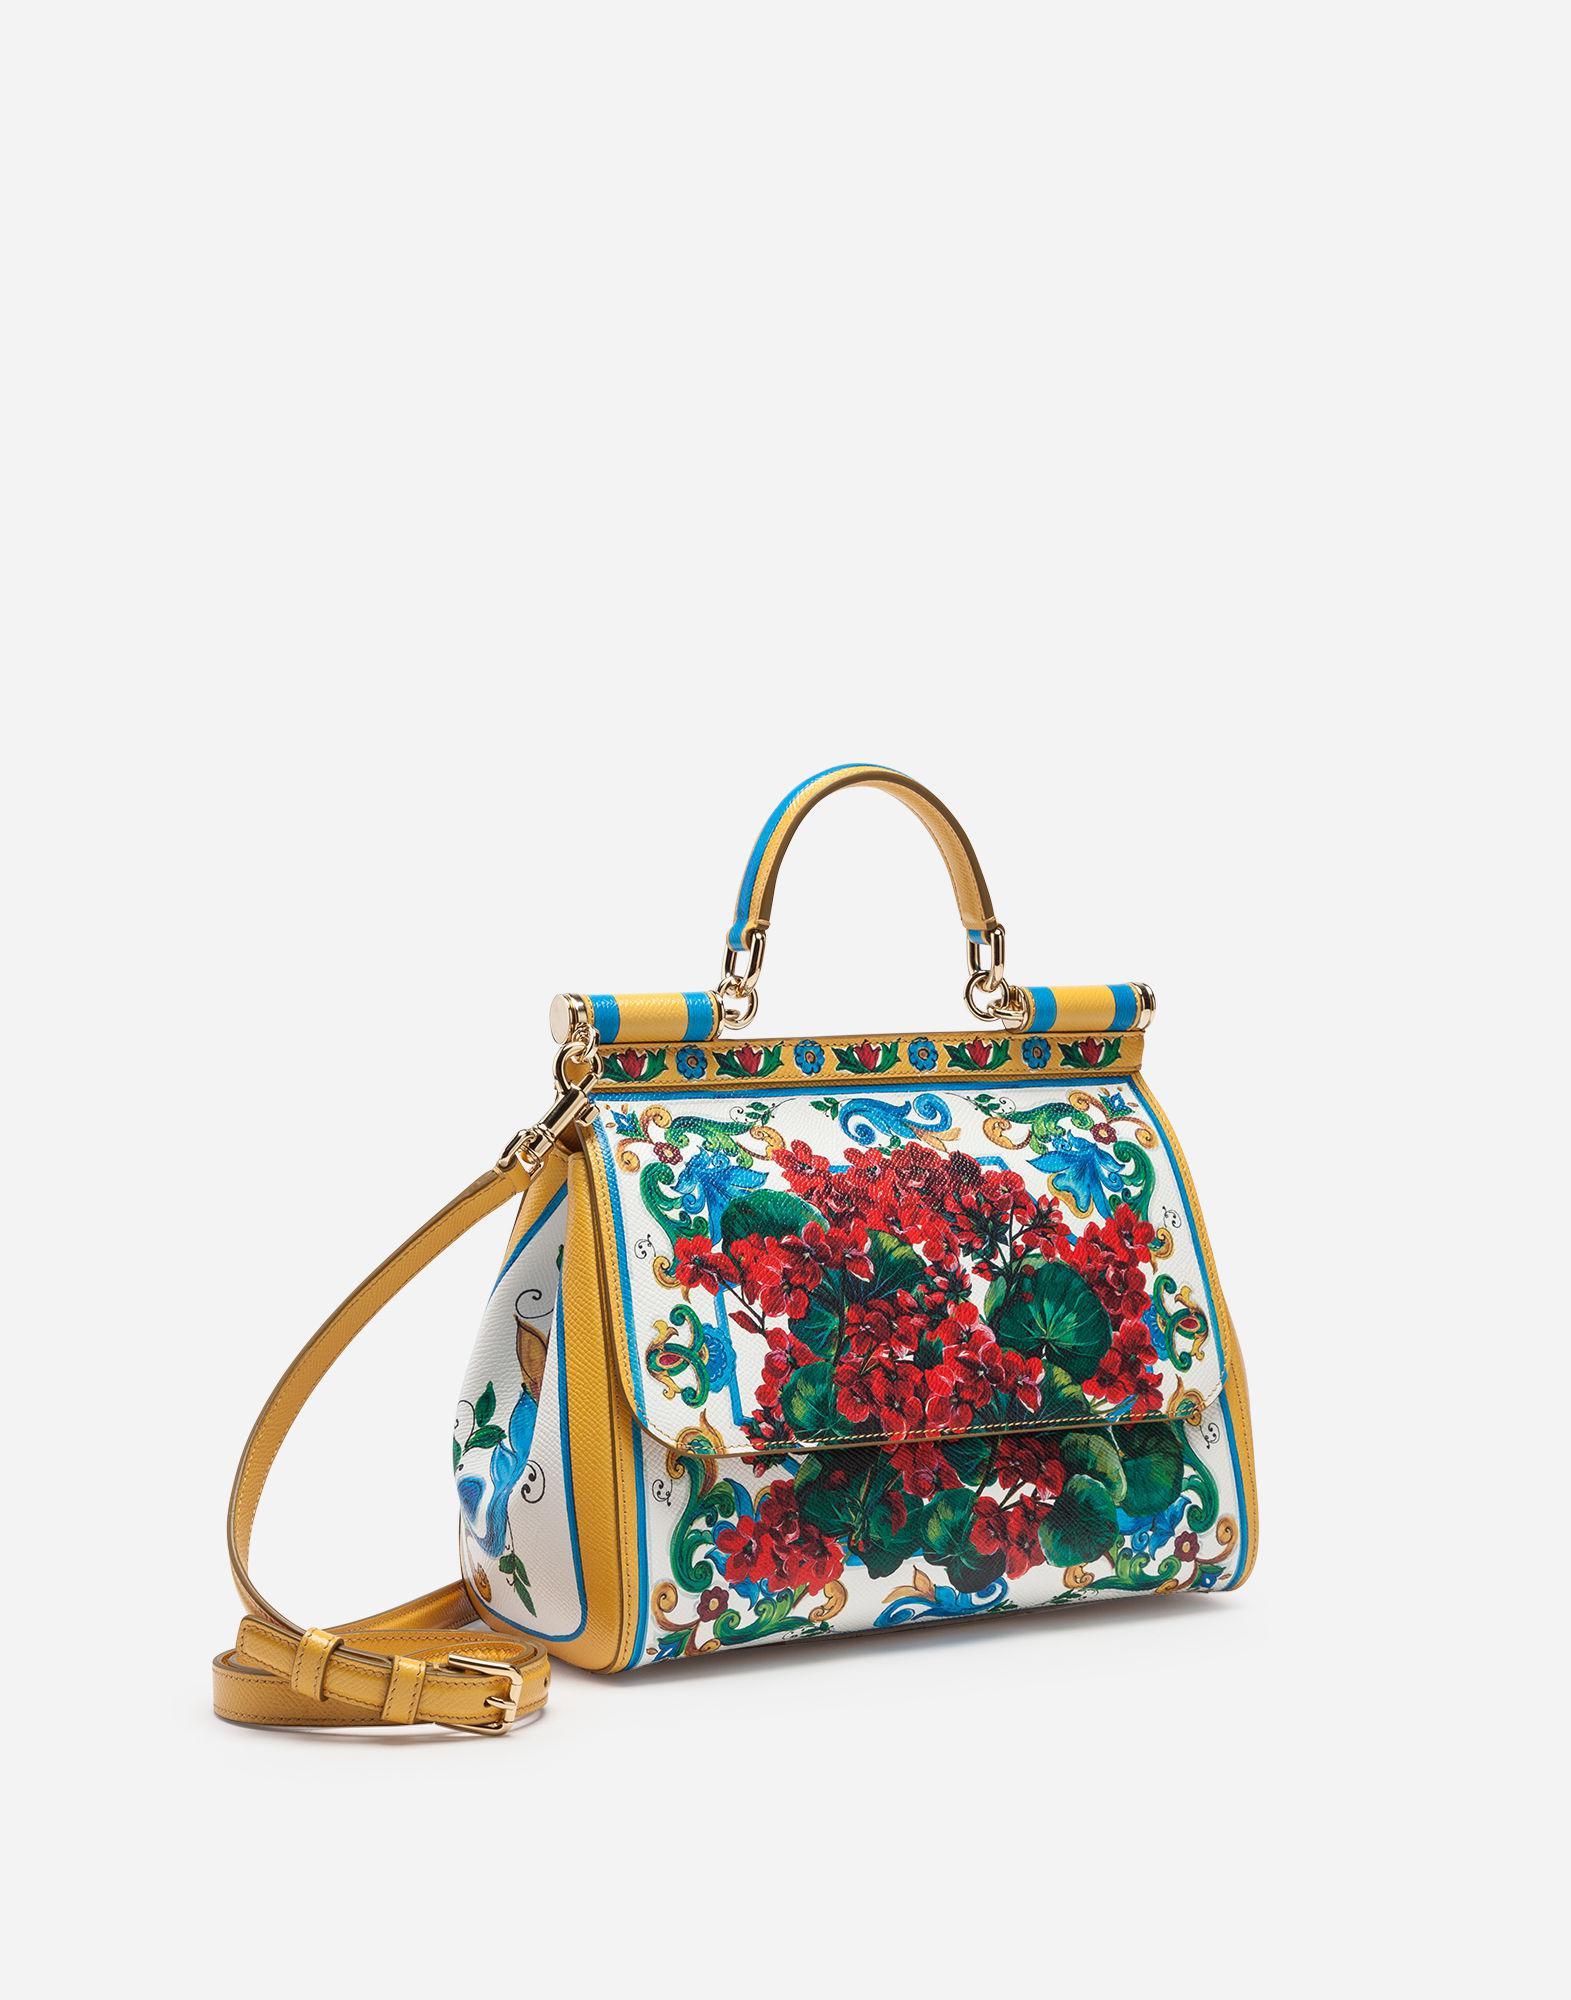 Lyst - Dolce   Gabbana Medium Sicily Bag In Printed Dauphine Calfskin 2c8f3b72f7